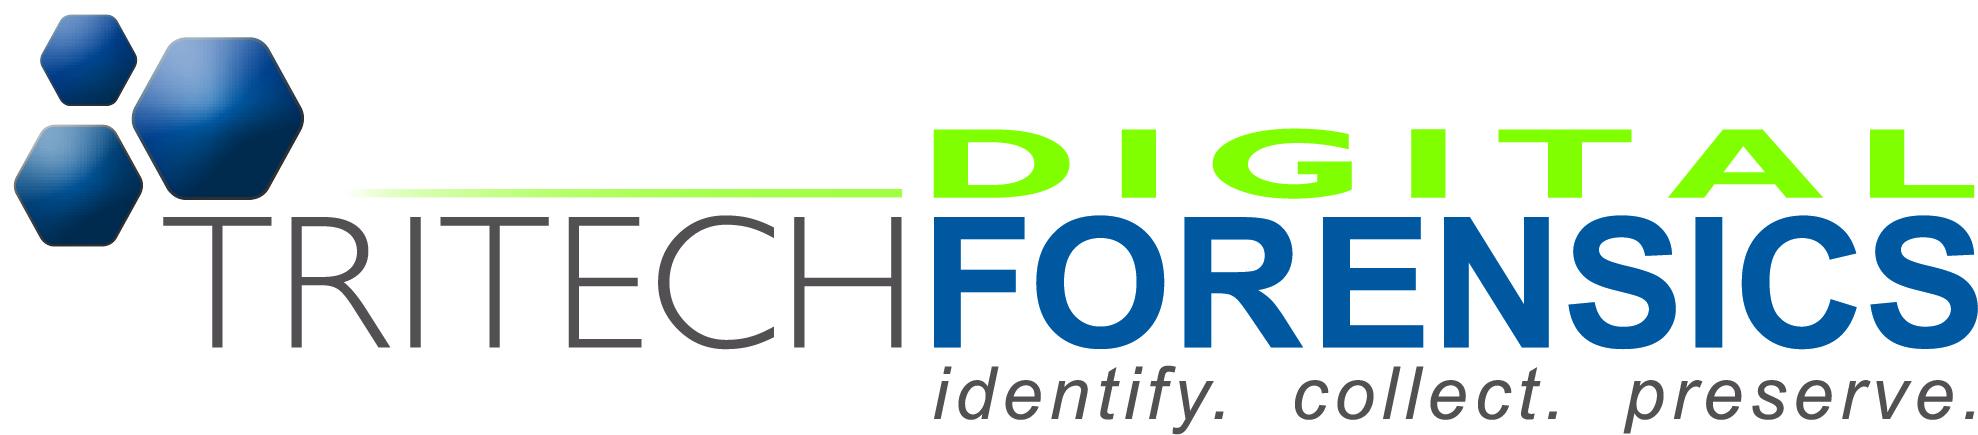 TTF DIGITAL FORENSICS LOGO RGB hi-res